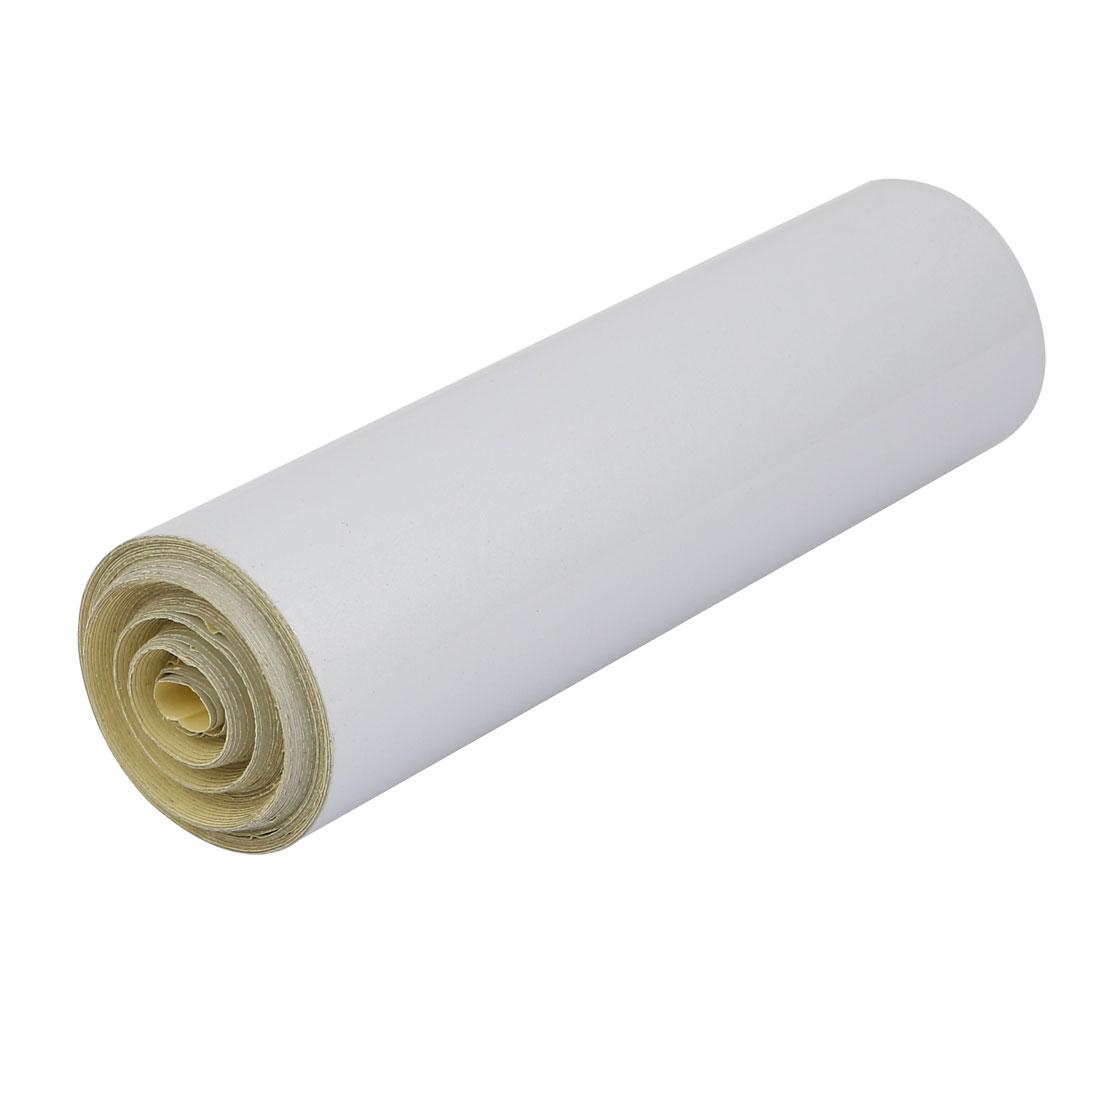 20cm Width 10M Length Single Sided Adhesive Reflective Warning Tape White